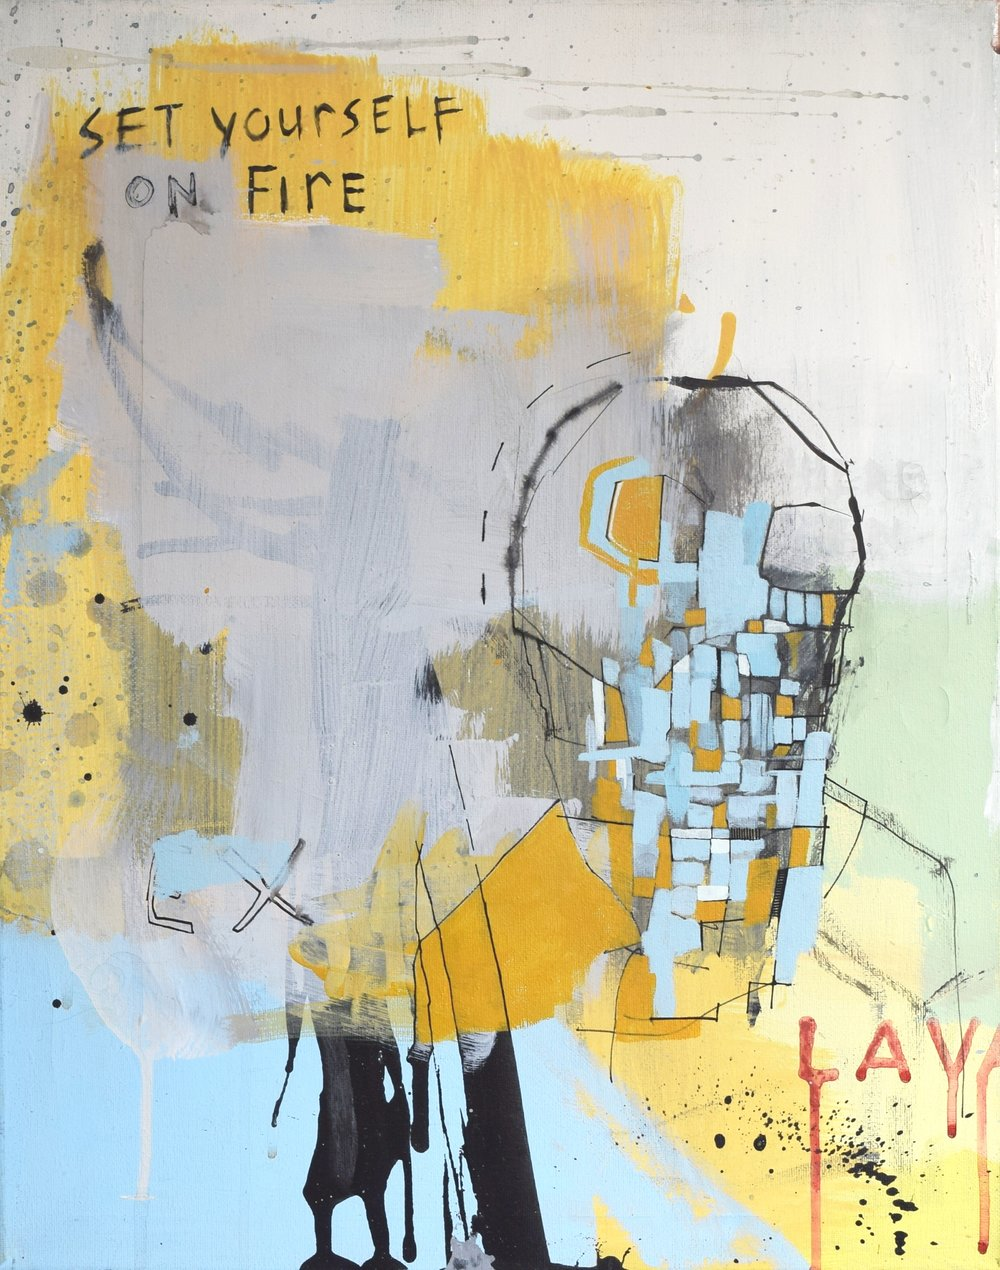 'LAVA' 2016    Acrylic paint, ink and spray paint on canvas 60 x 50 x 2 com